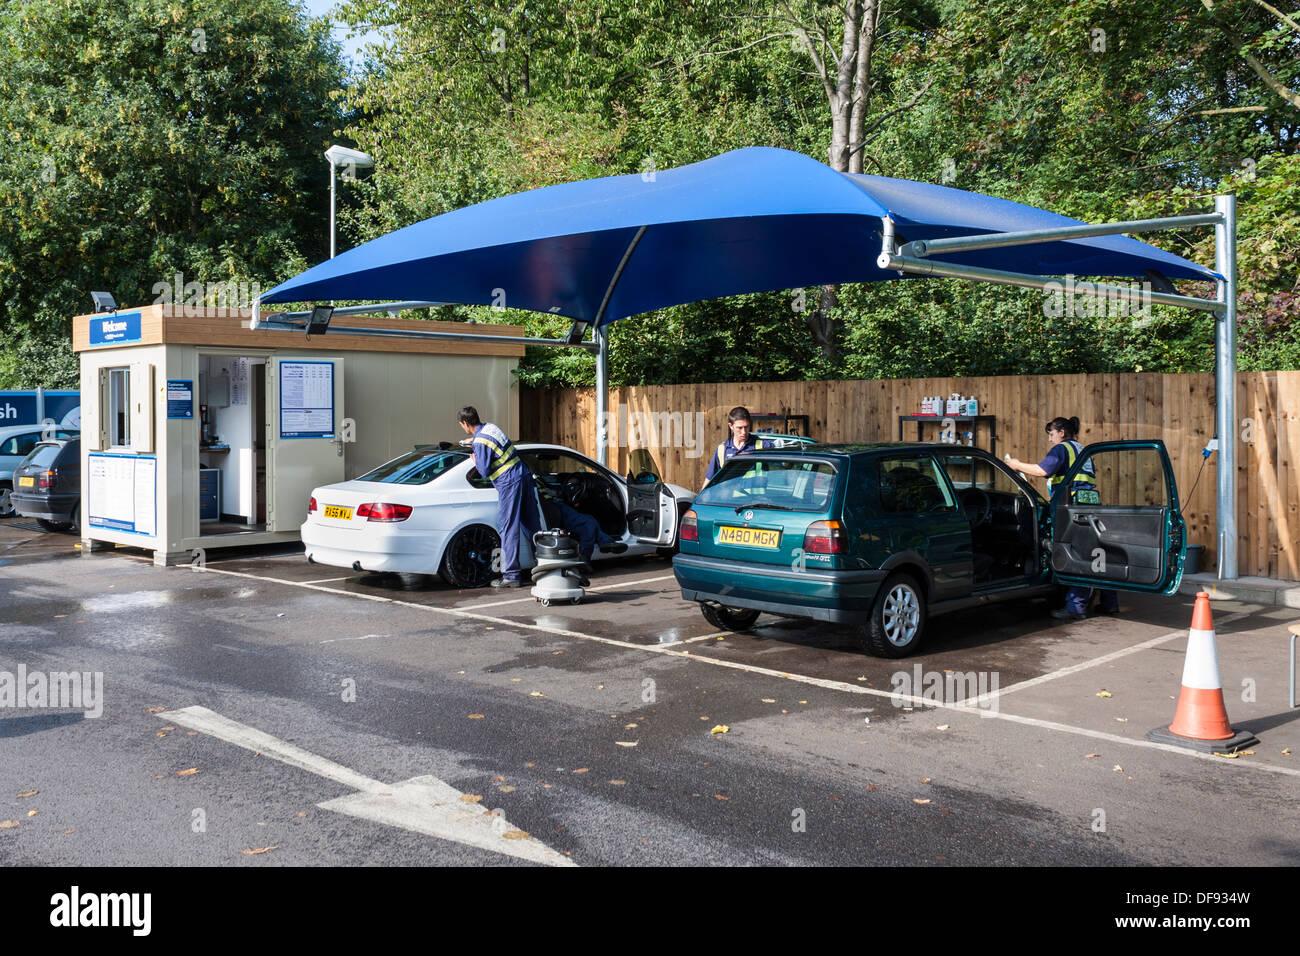 Hand Car Wash Service Im Supermarkt Tesco Car Park Reading